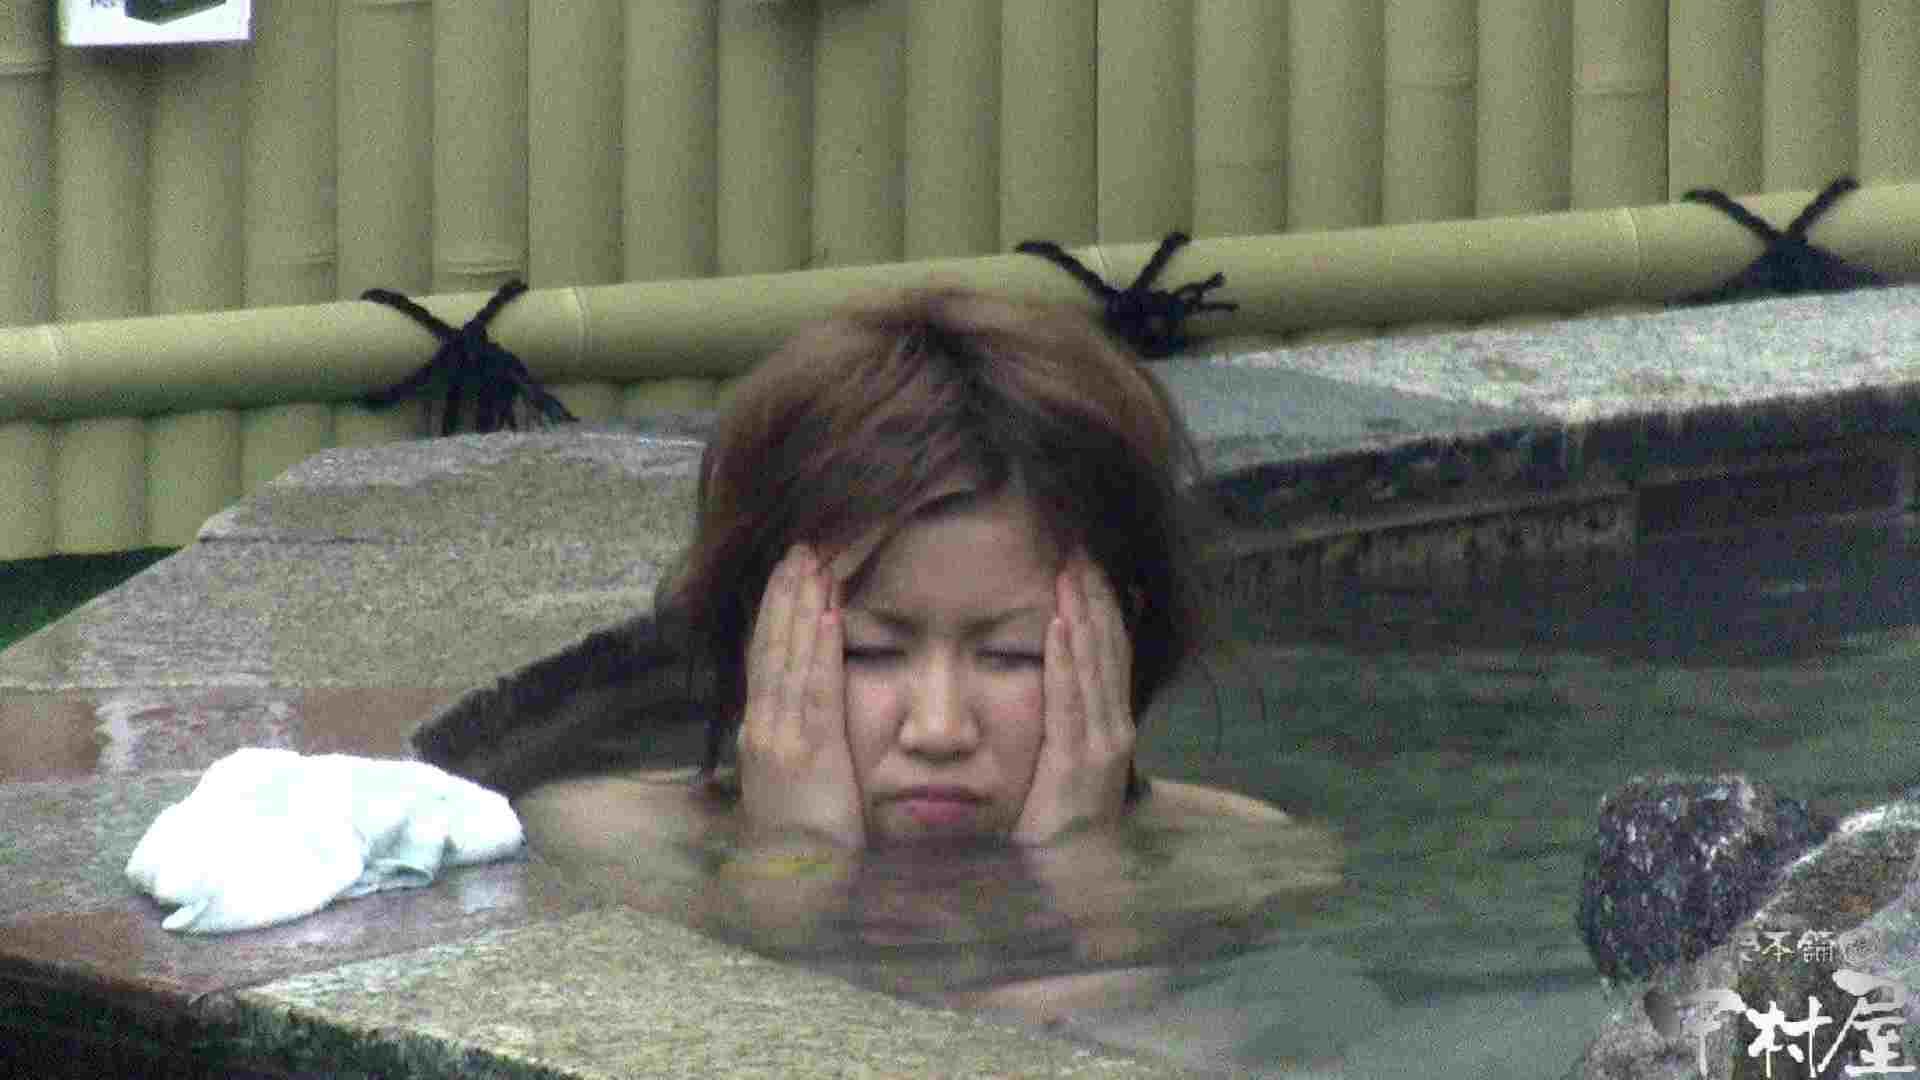 Aquaな露天風呂Vol.918 0 | 0  55連発 43